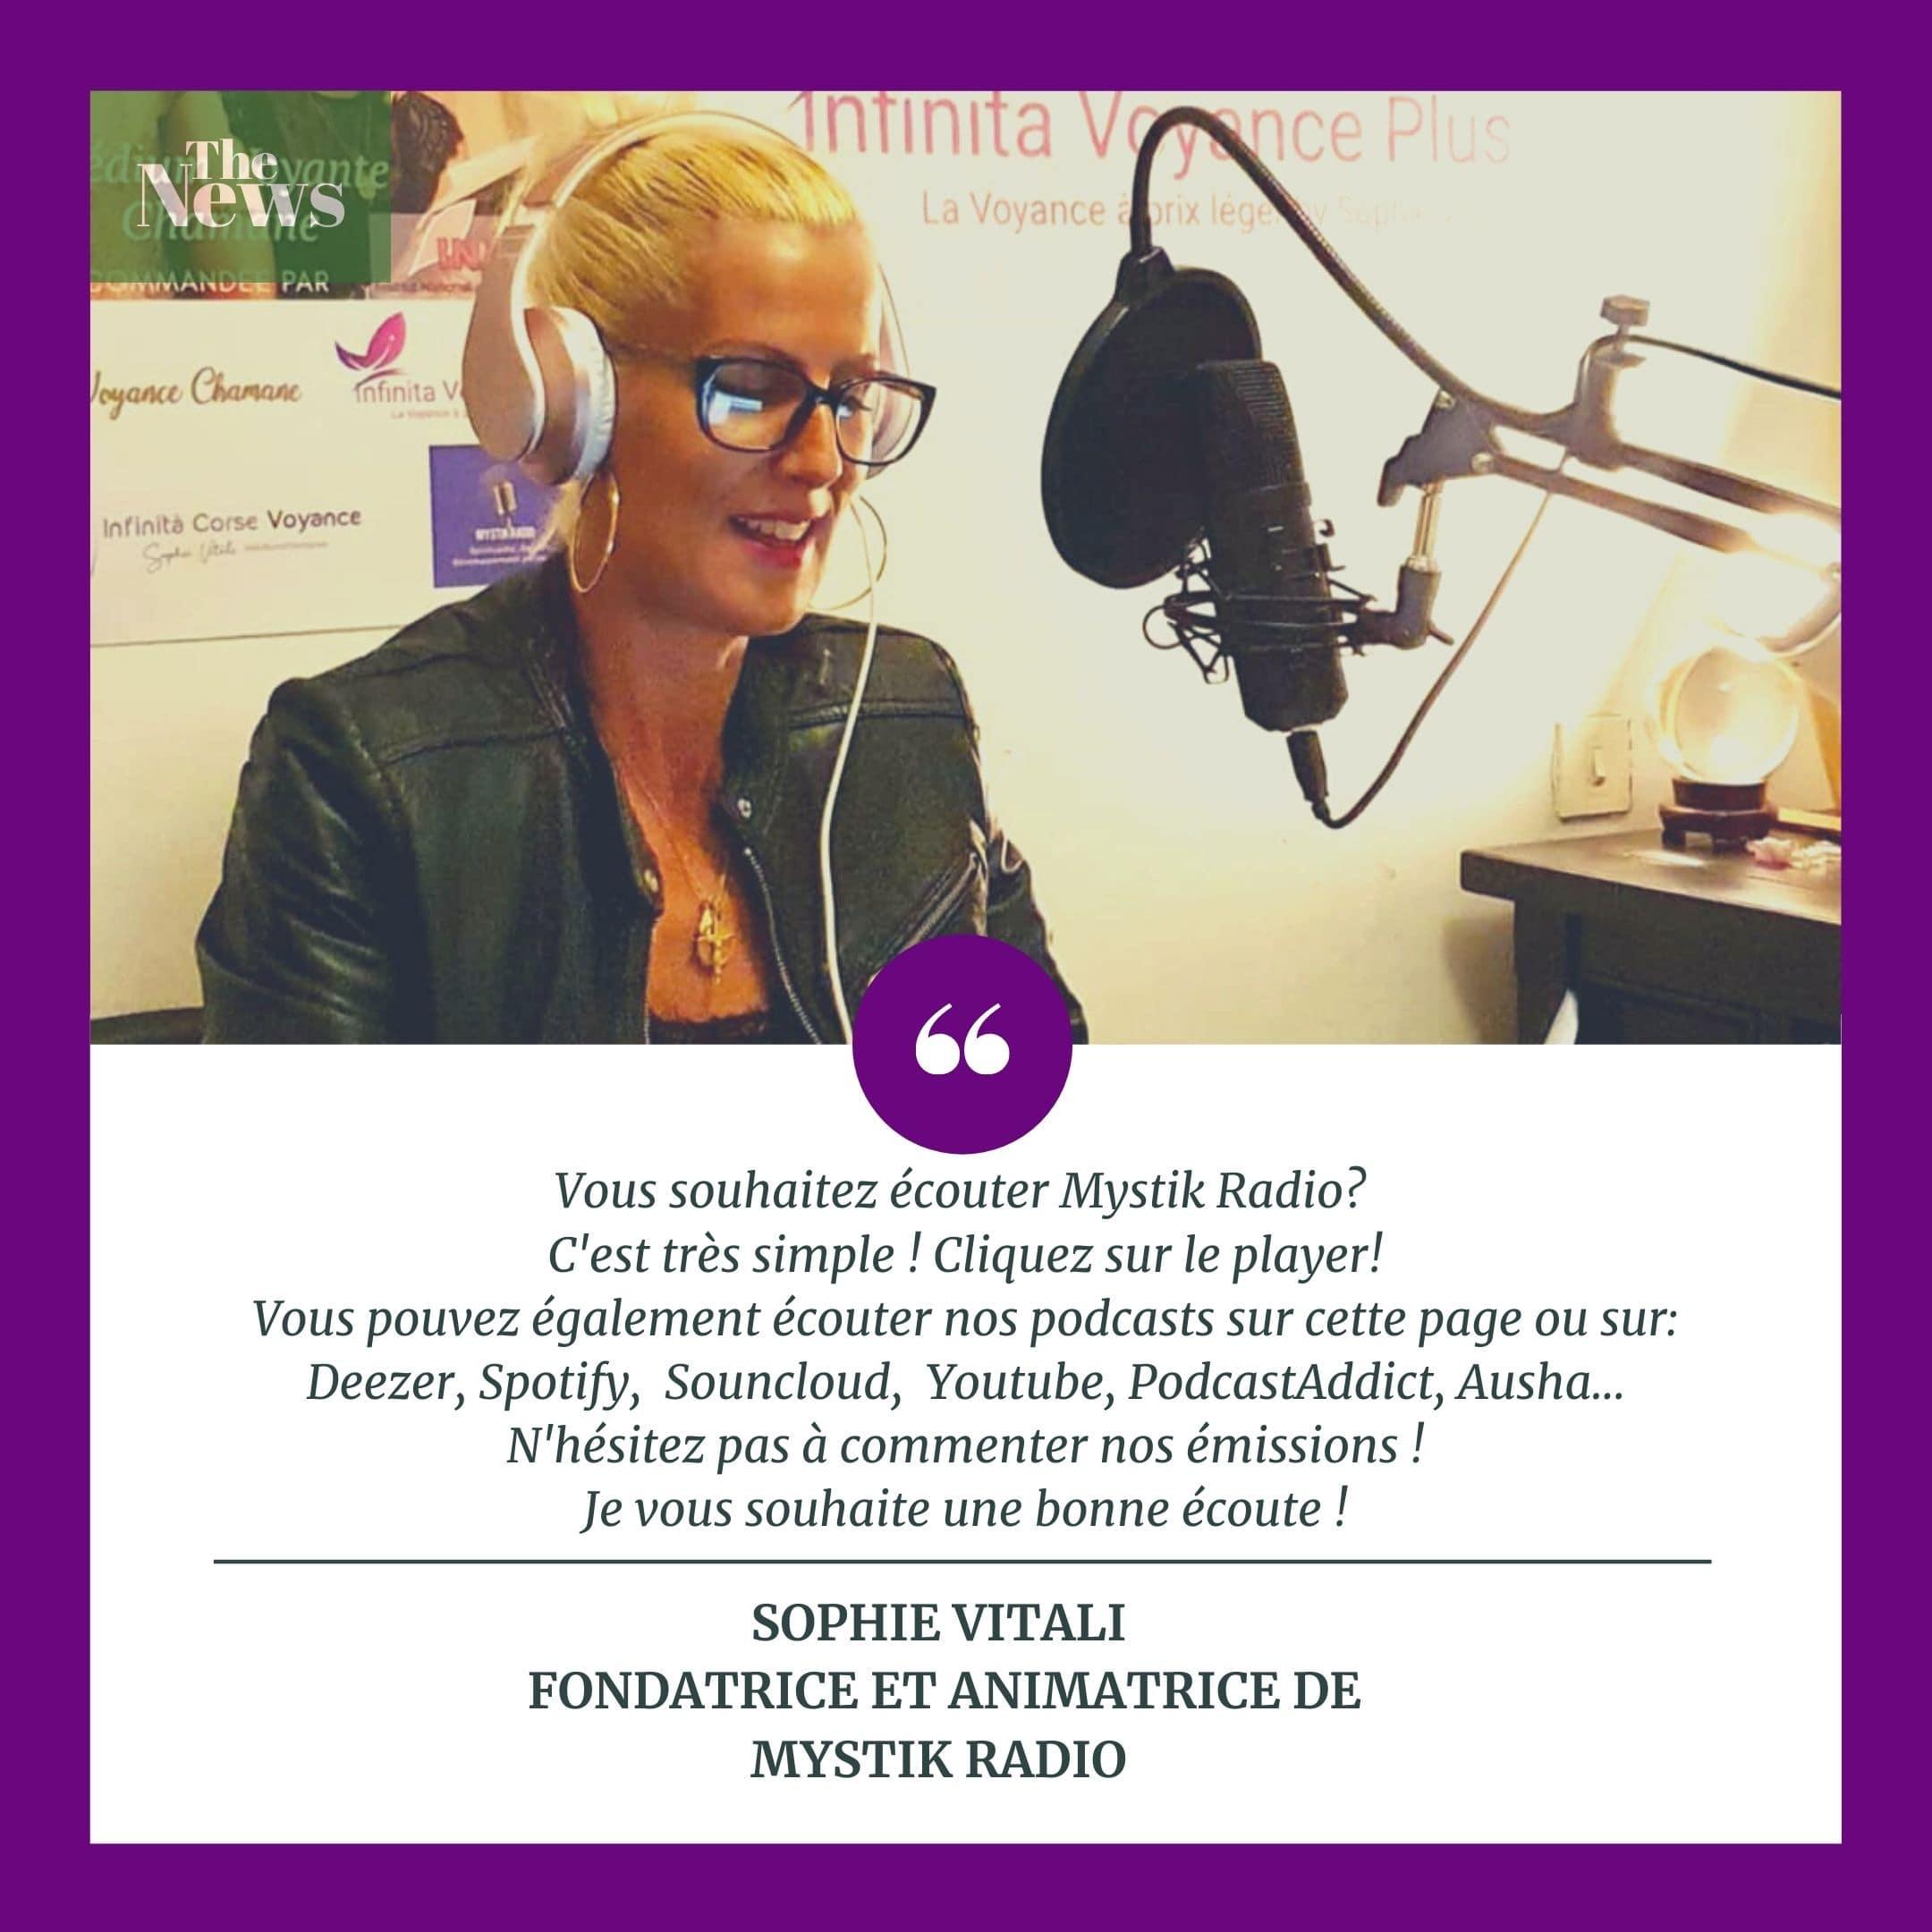 Sophie Vitali créatrice sur Mystik Radio